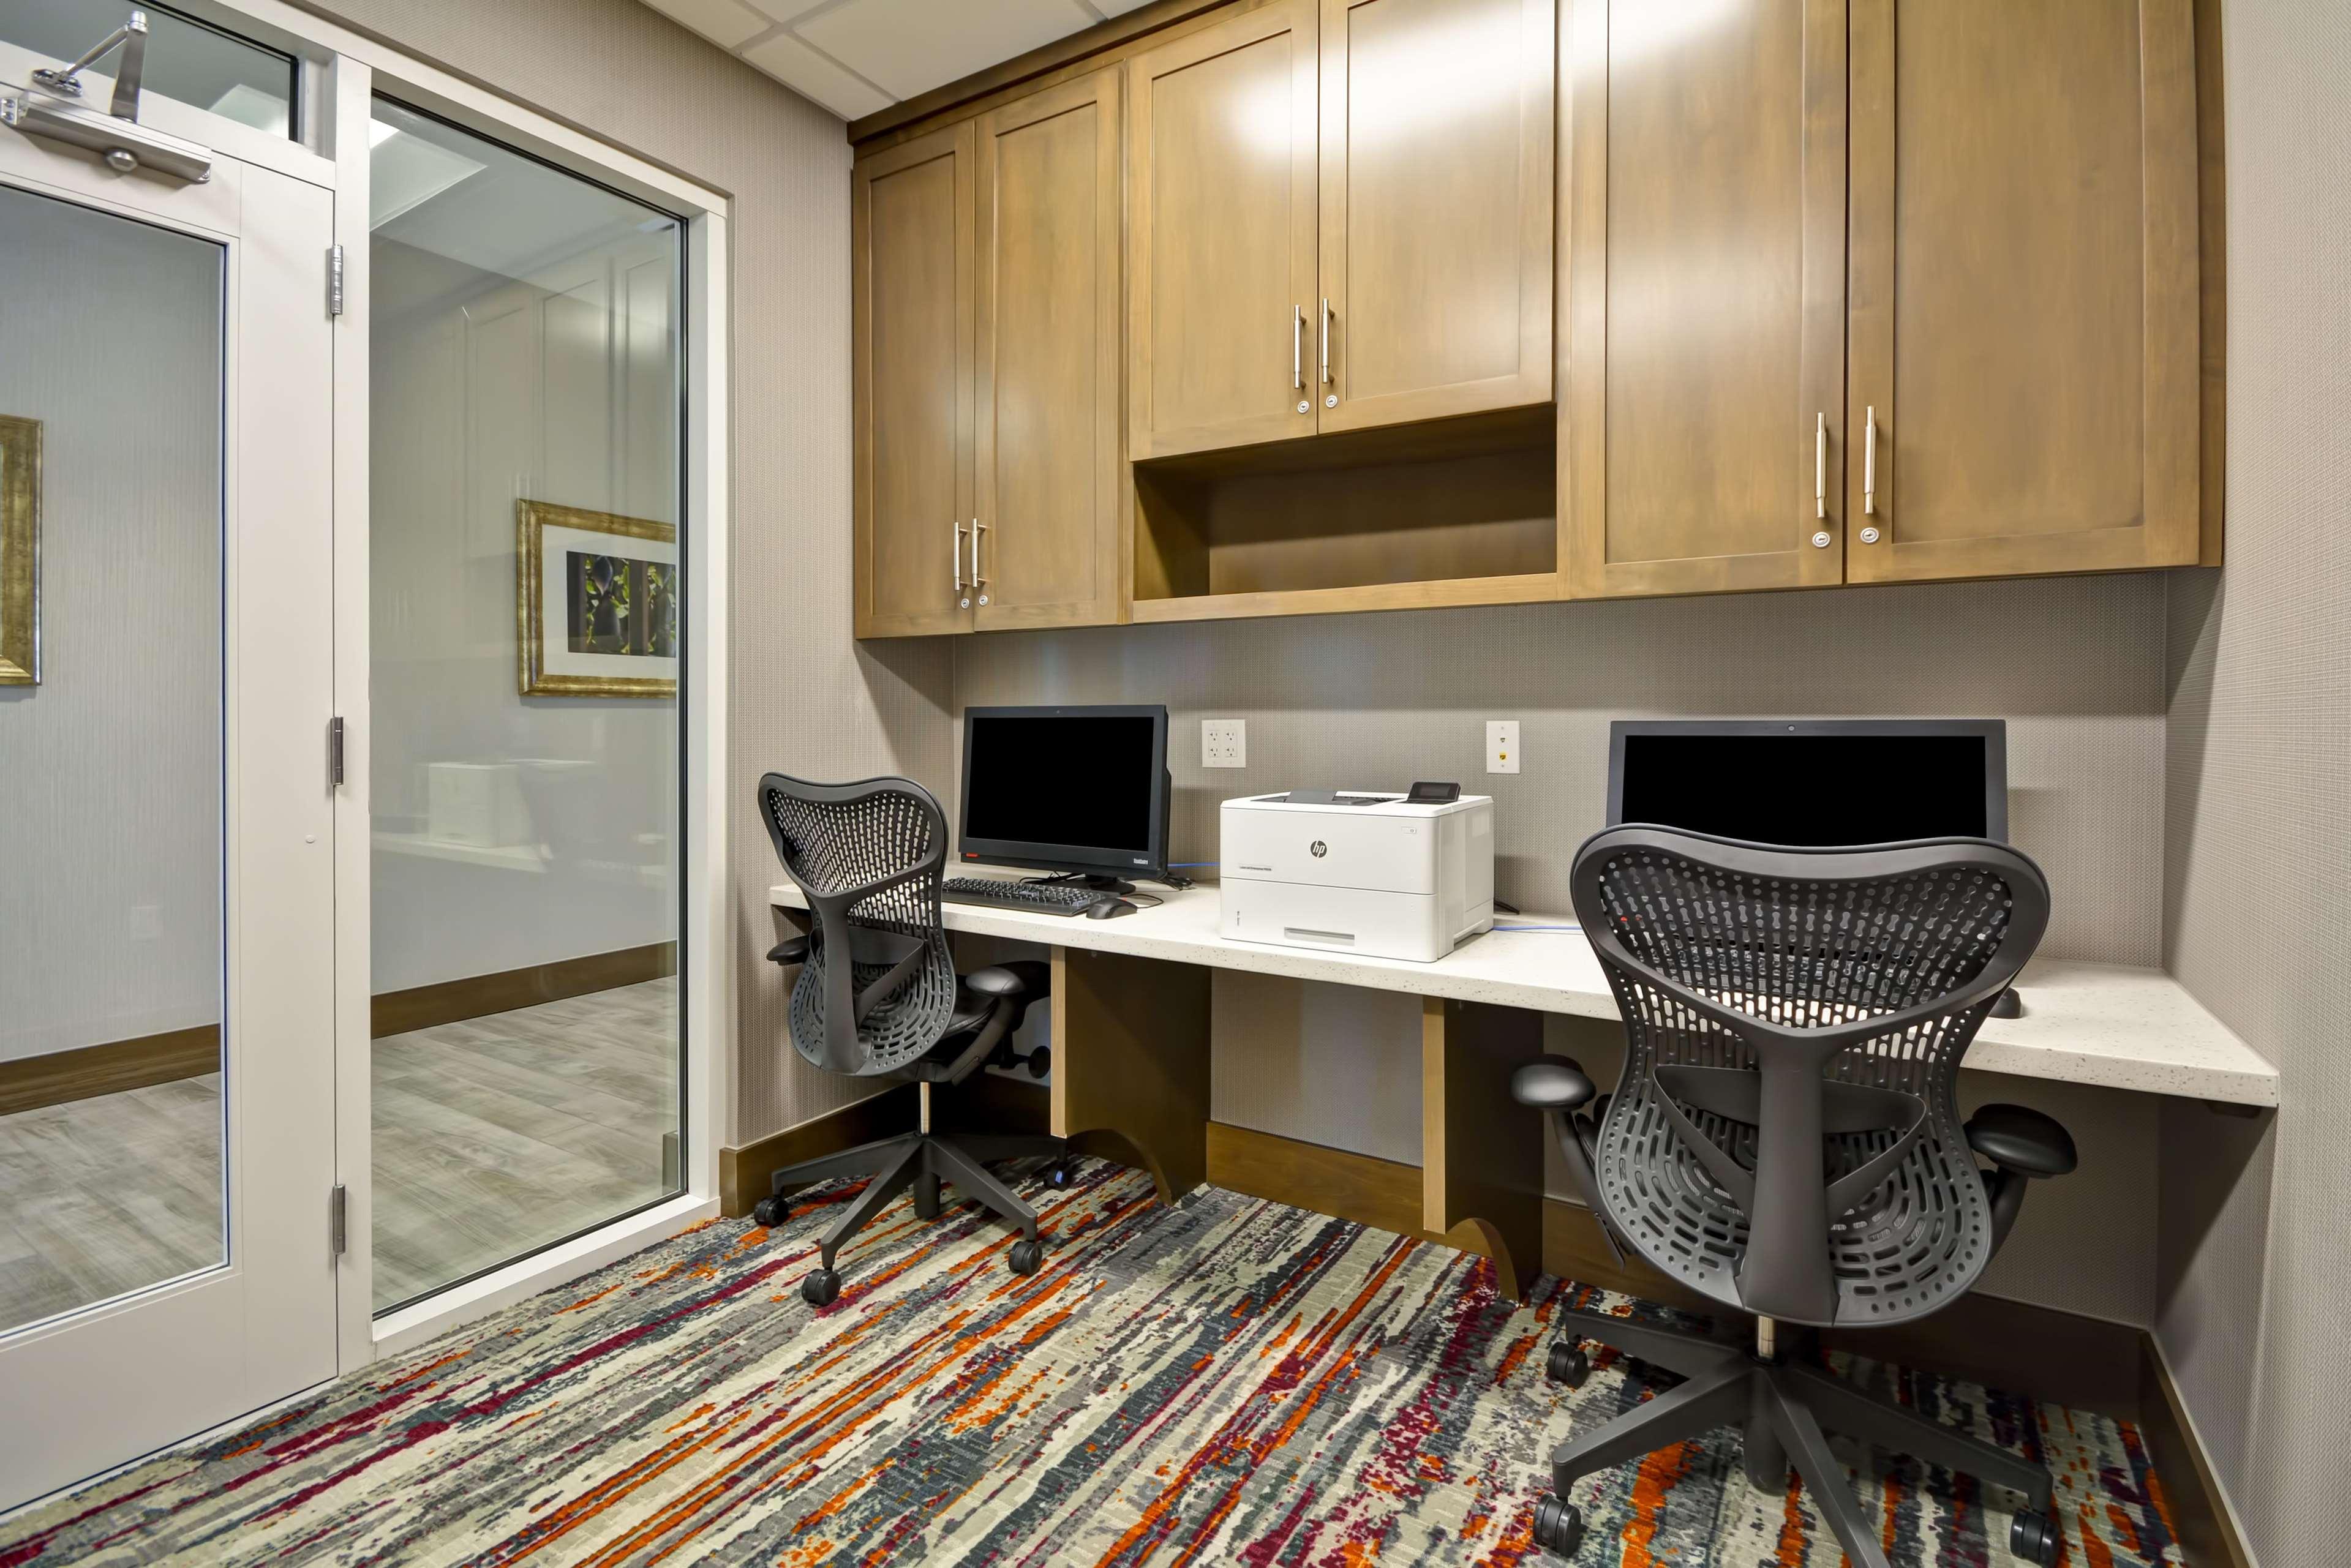 Hilton Garden Inn Phoenix/Tempe ASU Area image 28